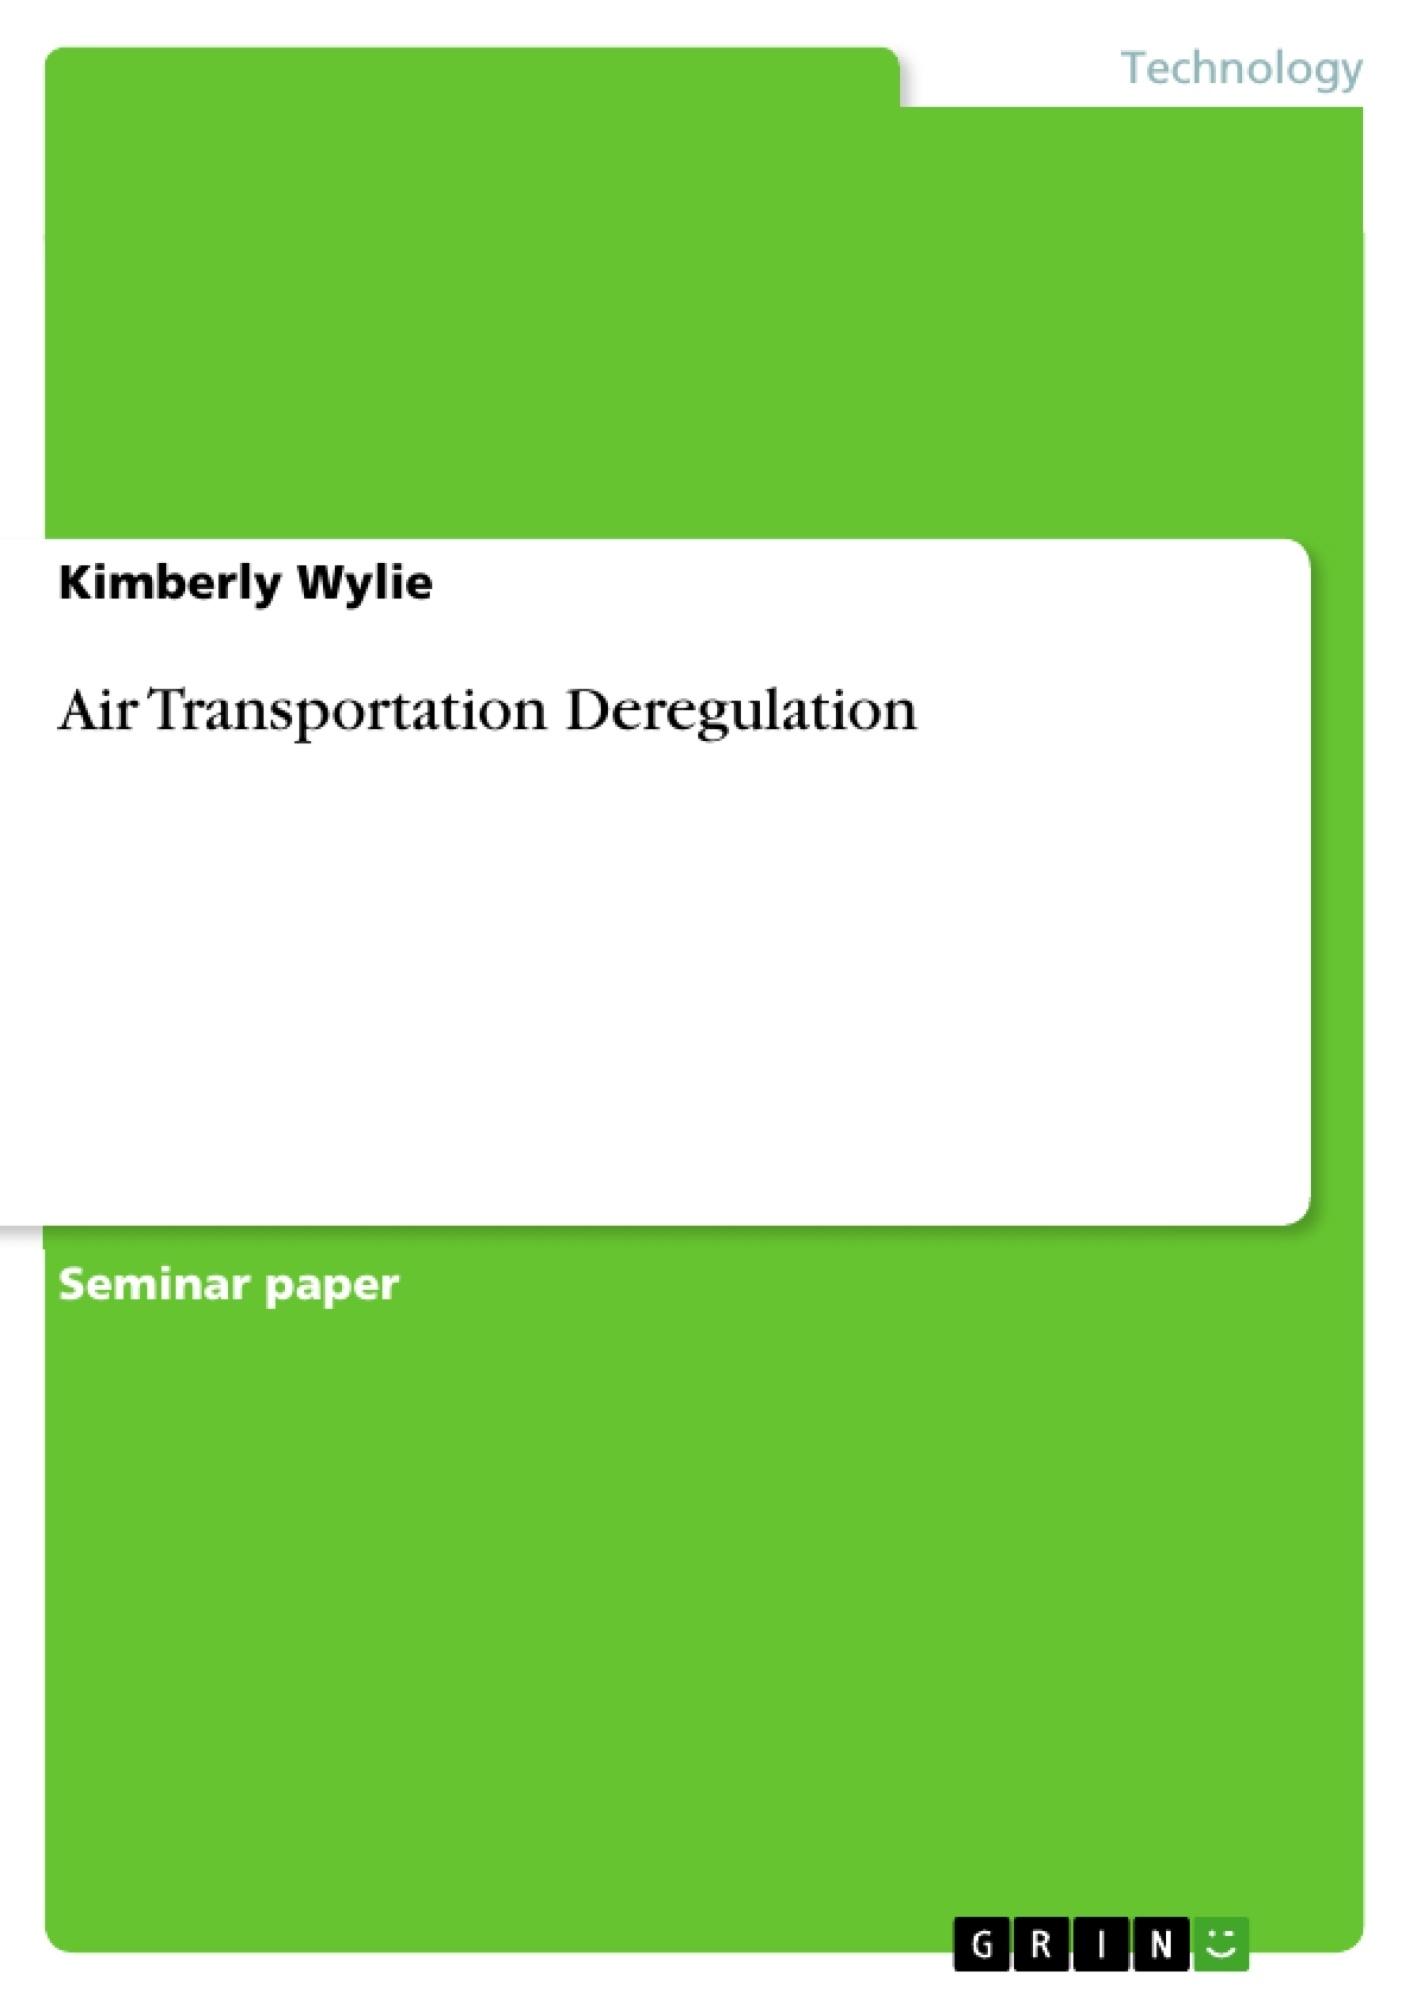 Title: Air Transportation Deregulation